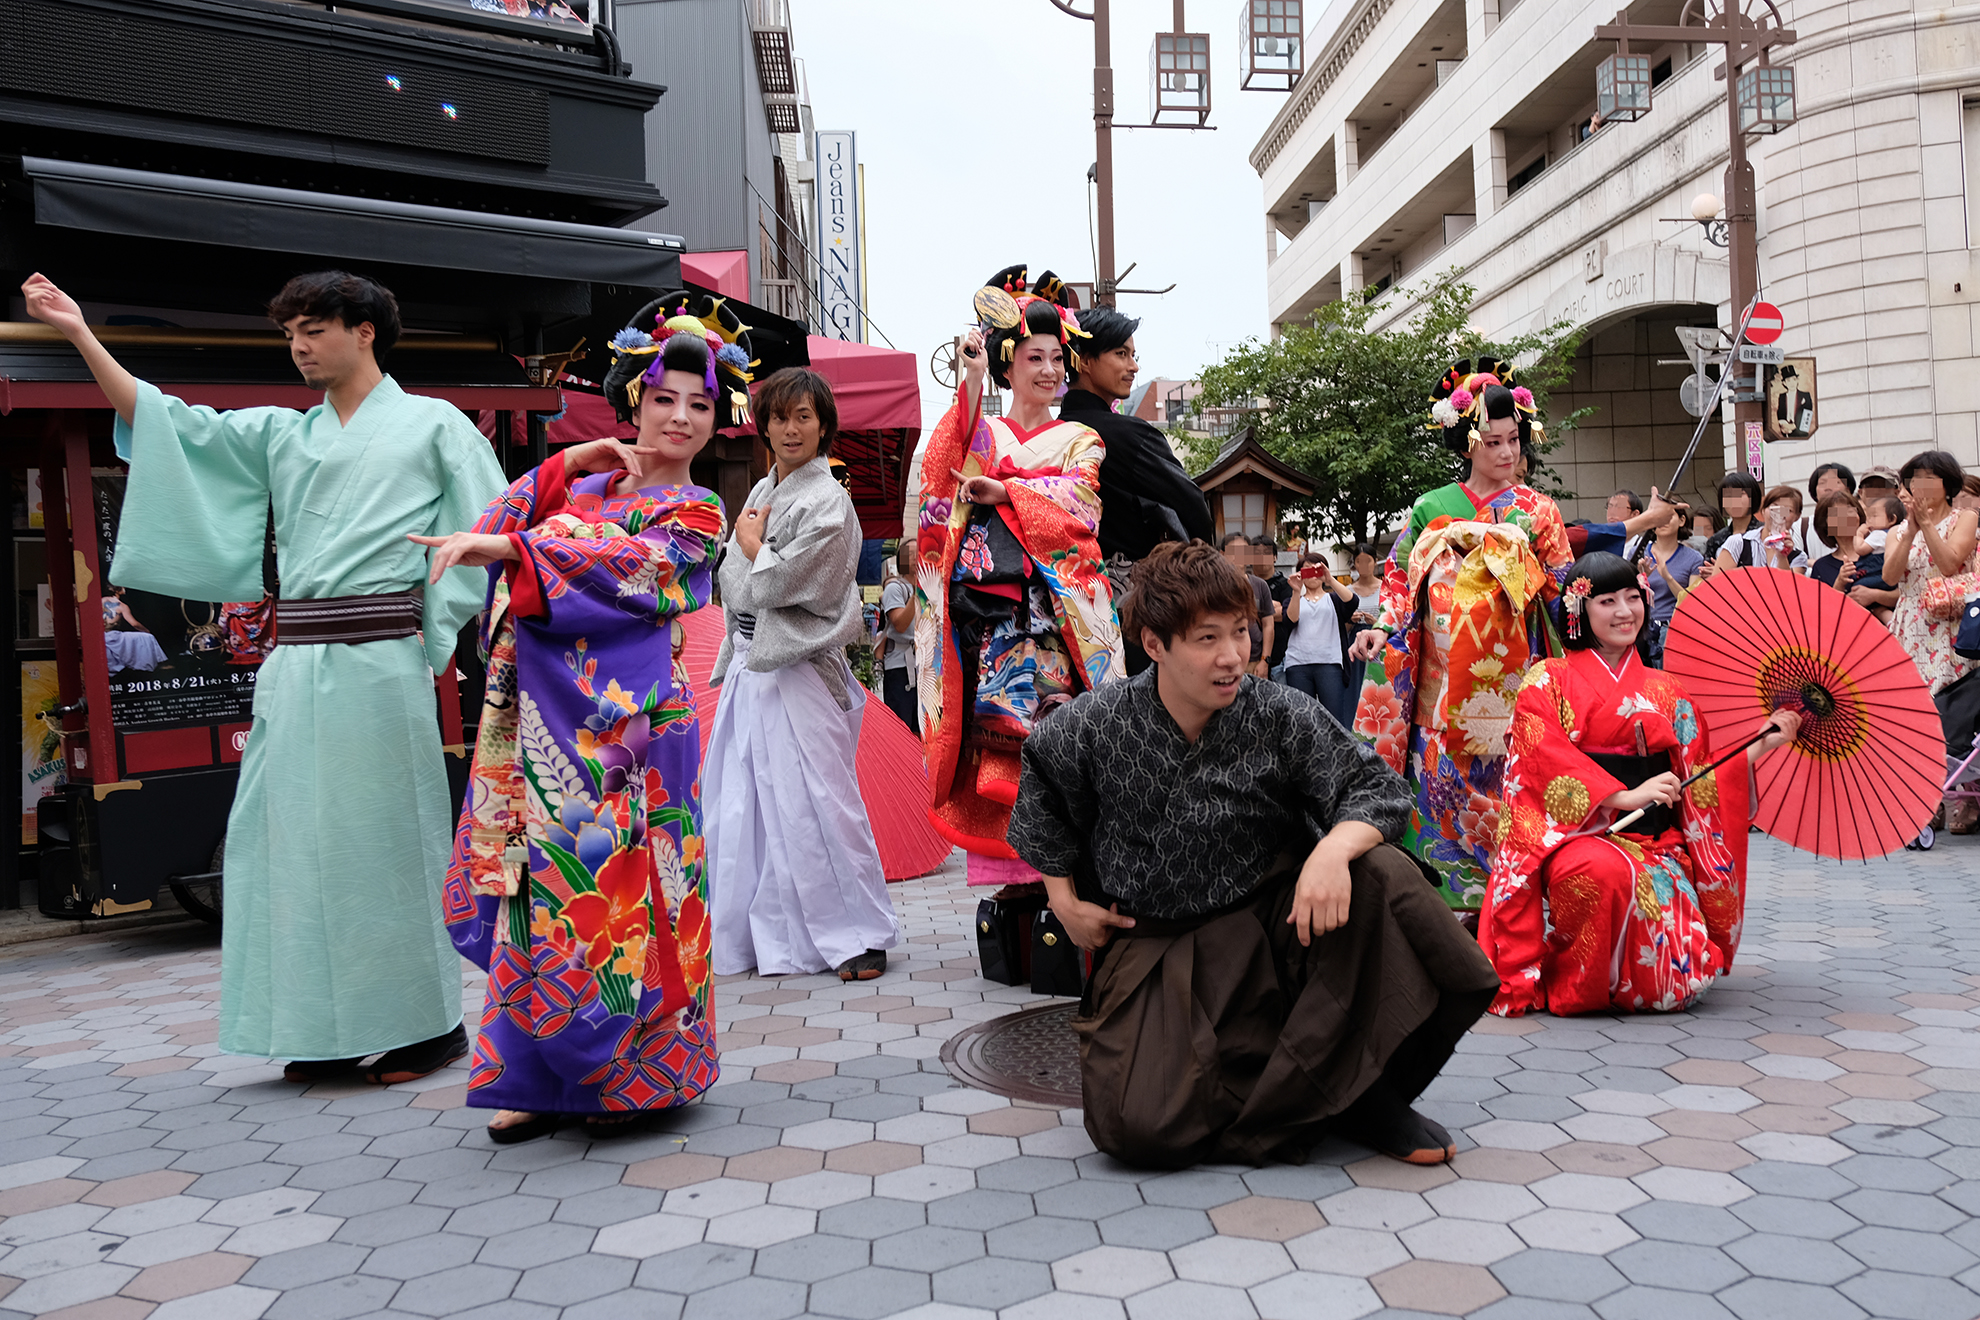 20180822【Press News】舞台『春夢共鏡』浅草六区ブロードウェイをジャック!